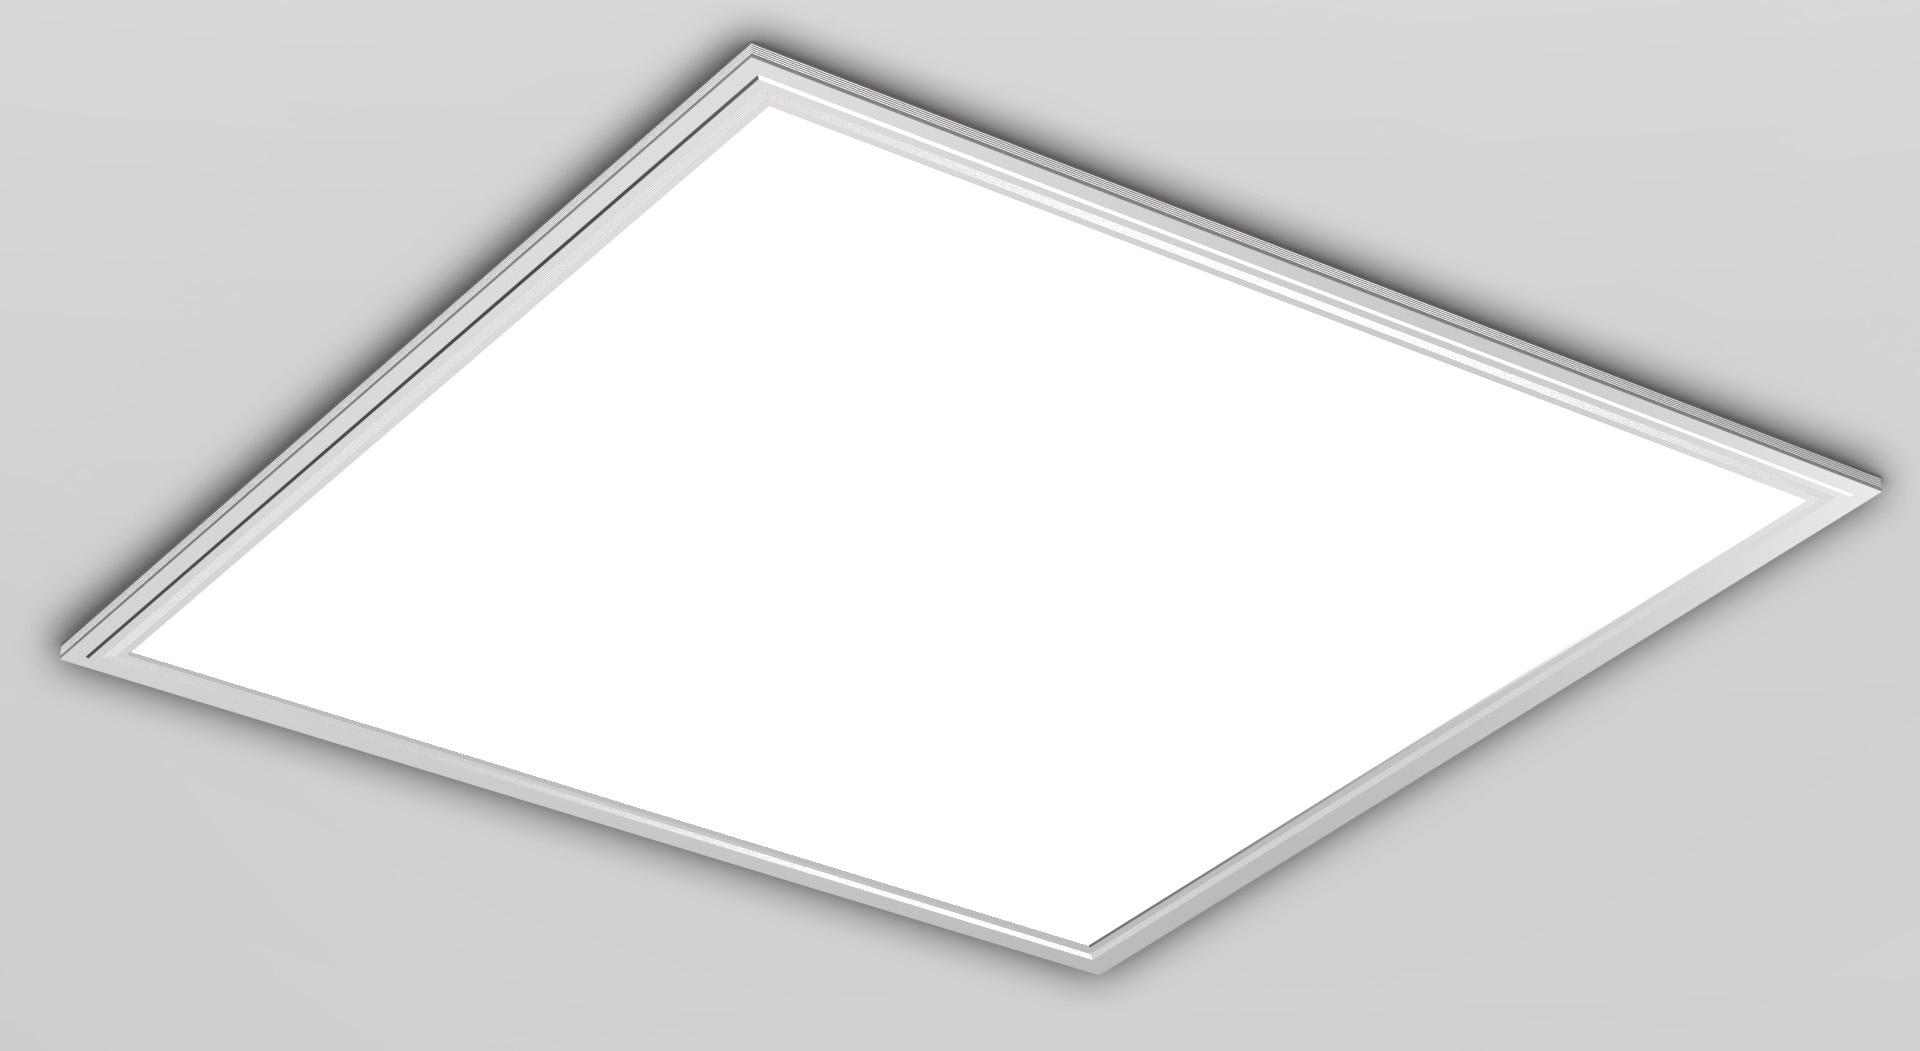 led lighting company kit recessed electric globe wayfair pdp ca